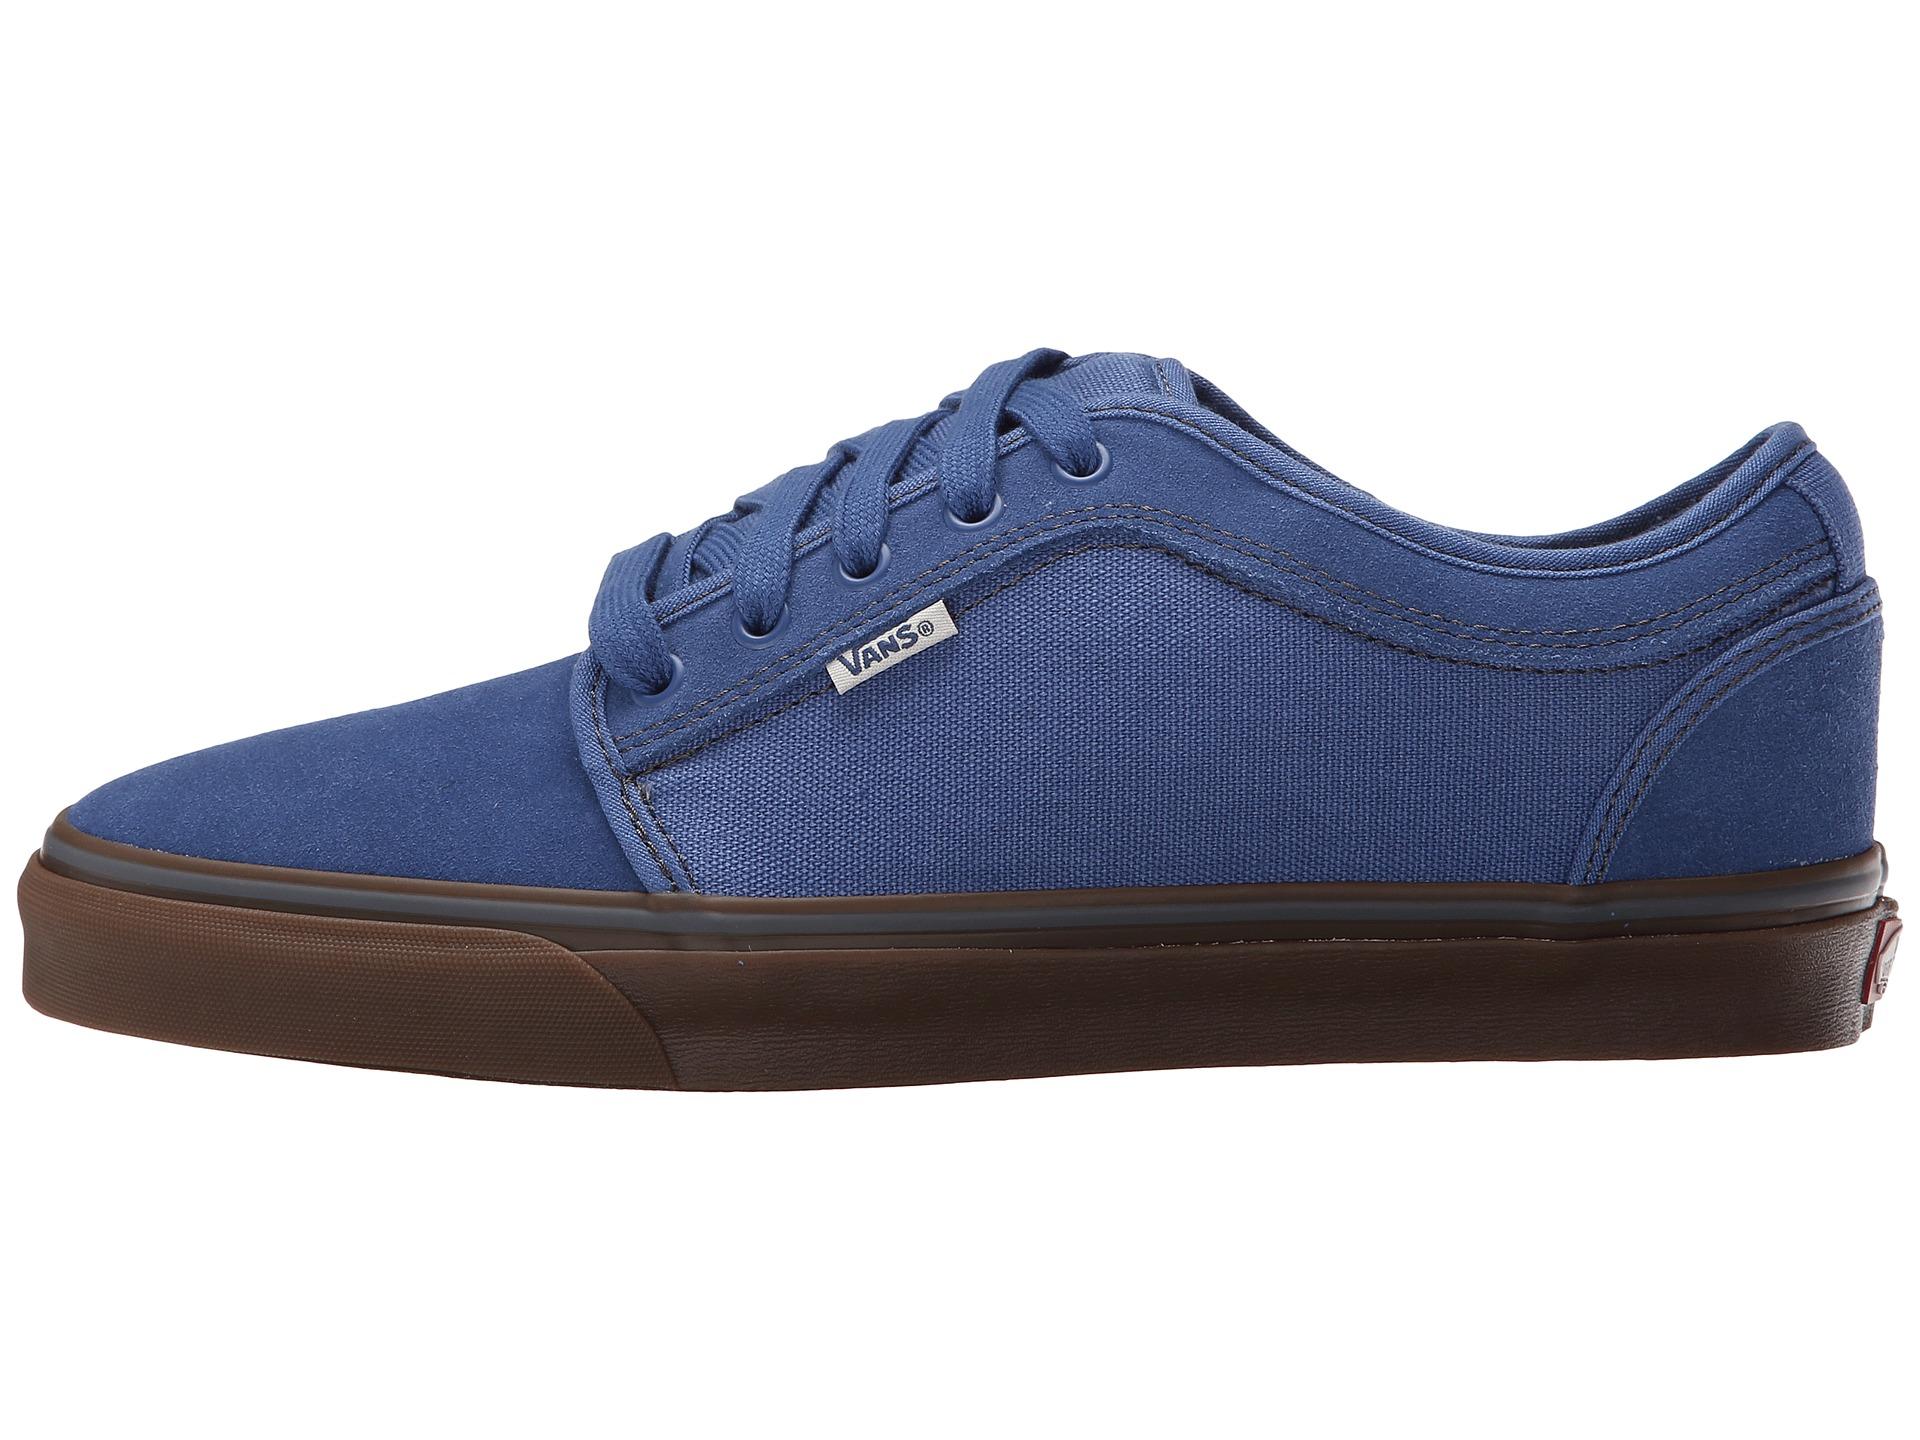 vans chukka low labels blue gum zappos free